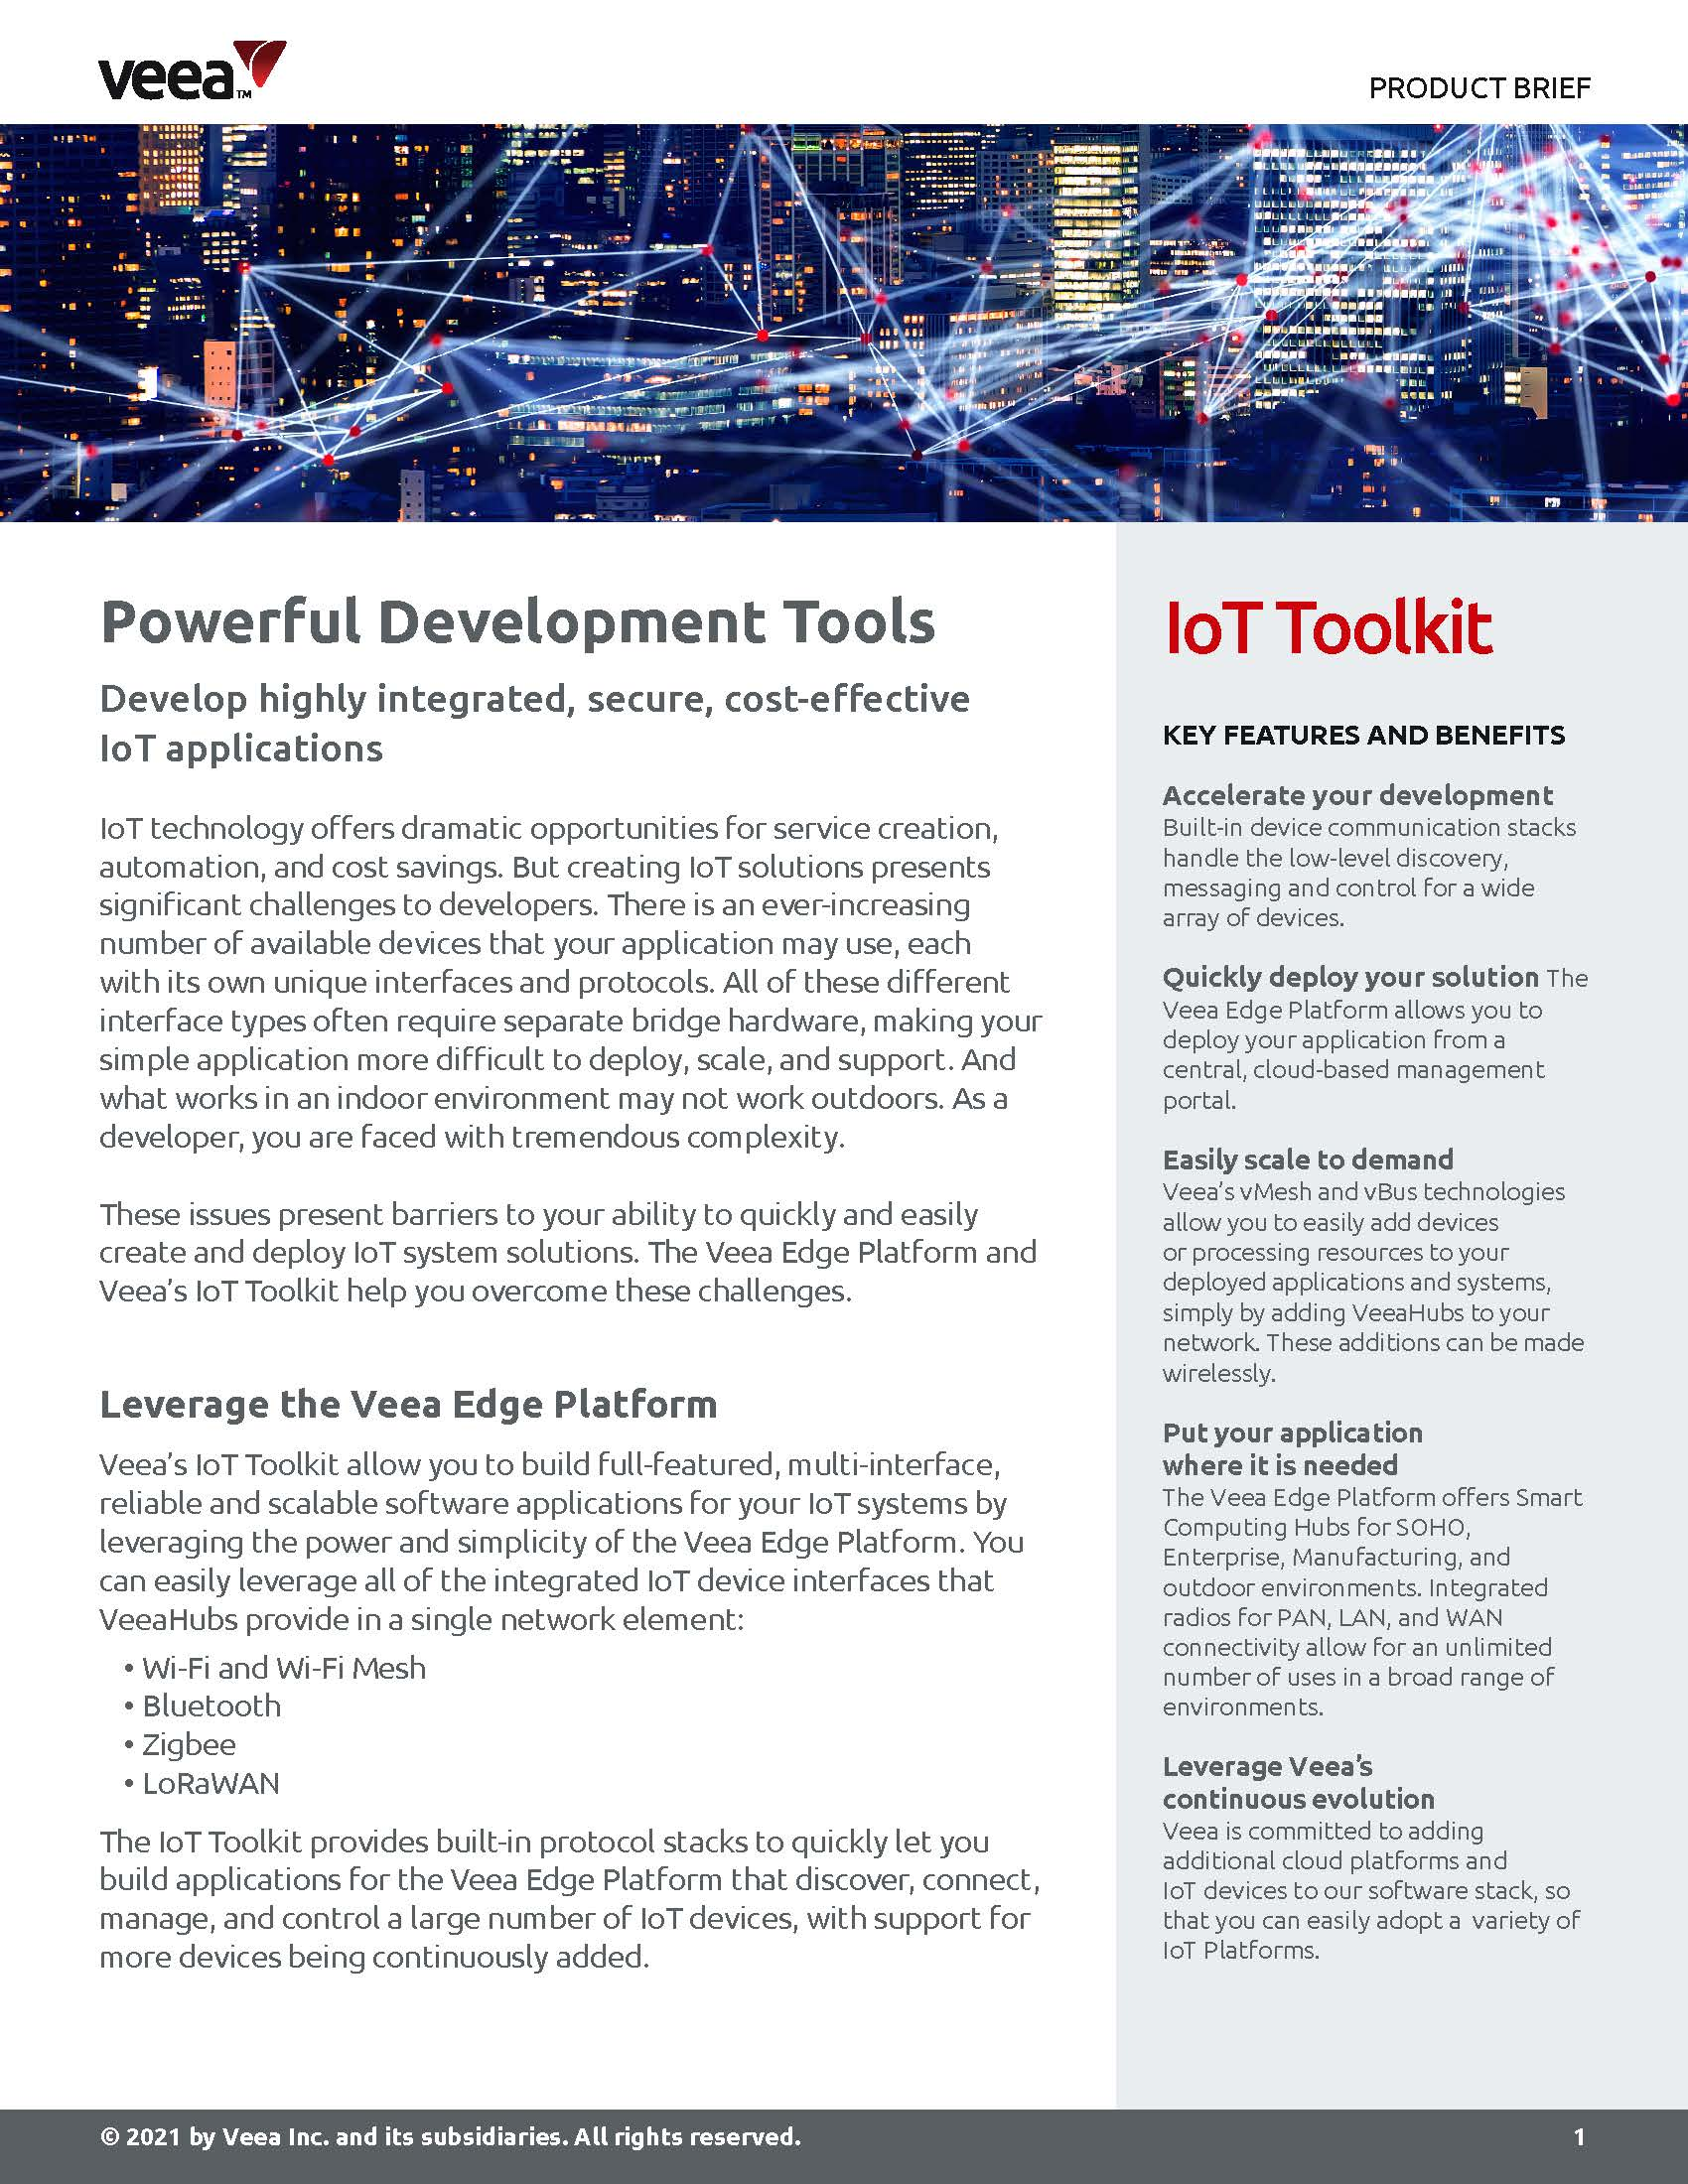 IoT Toolkit prod brief cover